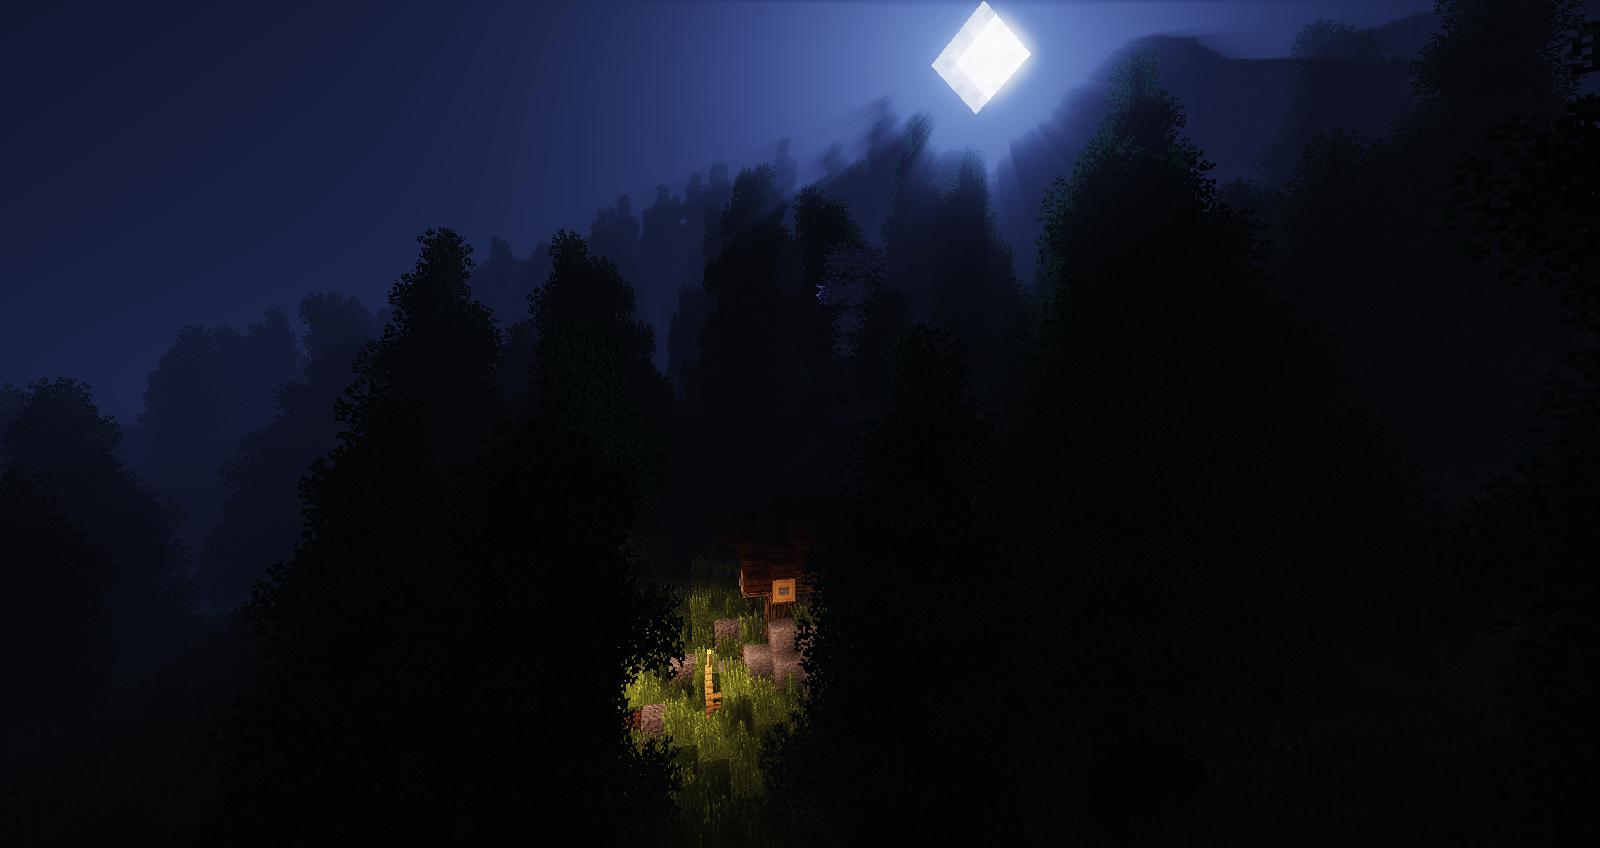 Beautiful Wallpaper Minecraft Night - fr-minecraft_2T2I_aganad6  Trends_548958.png